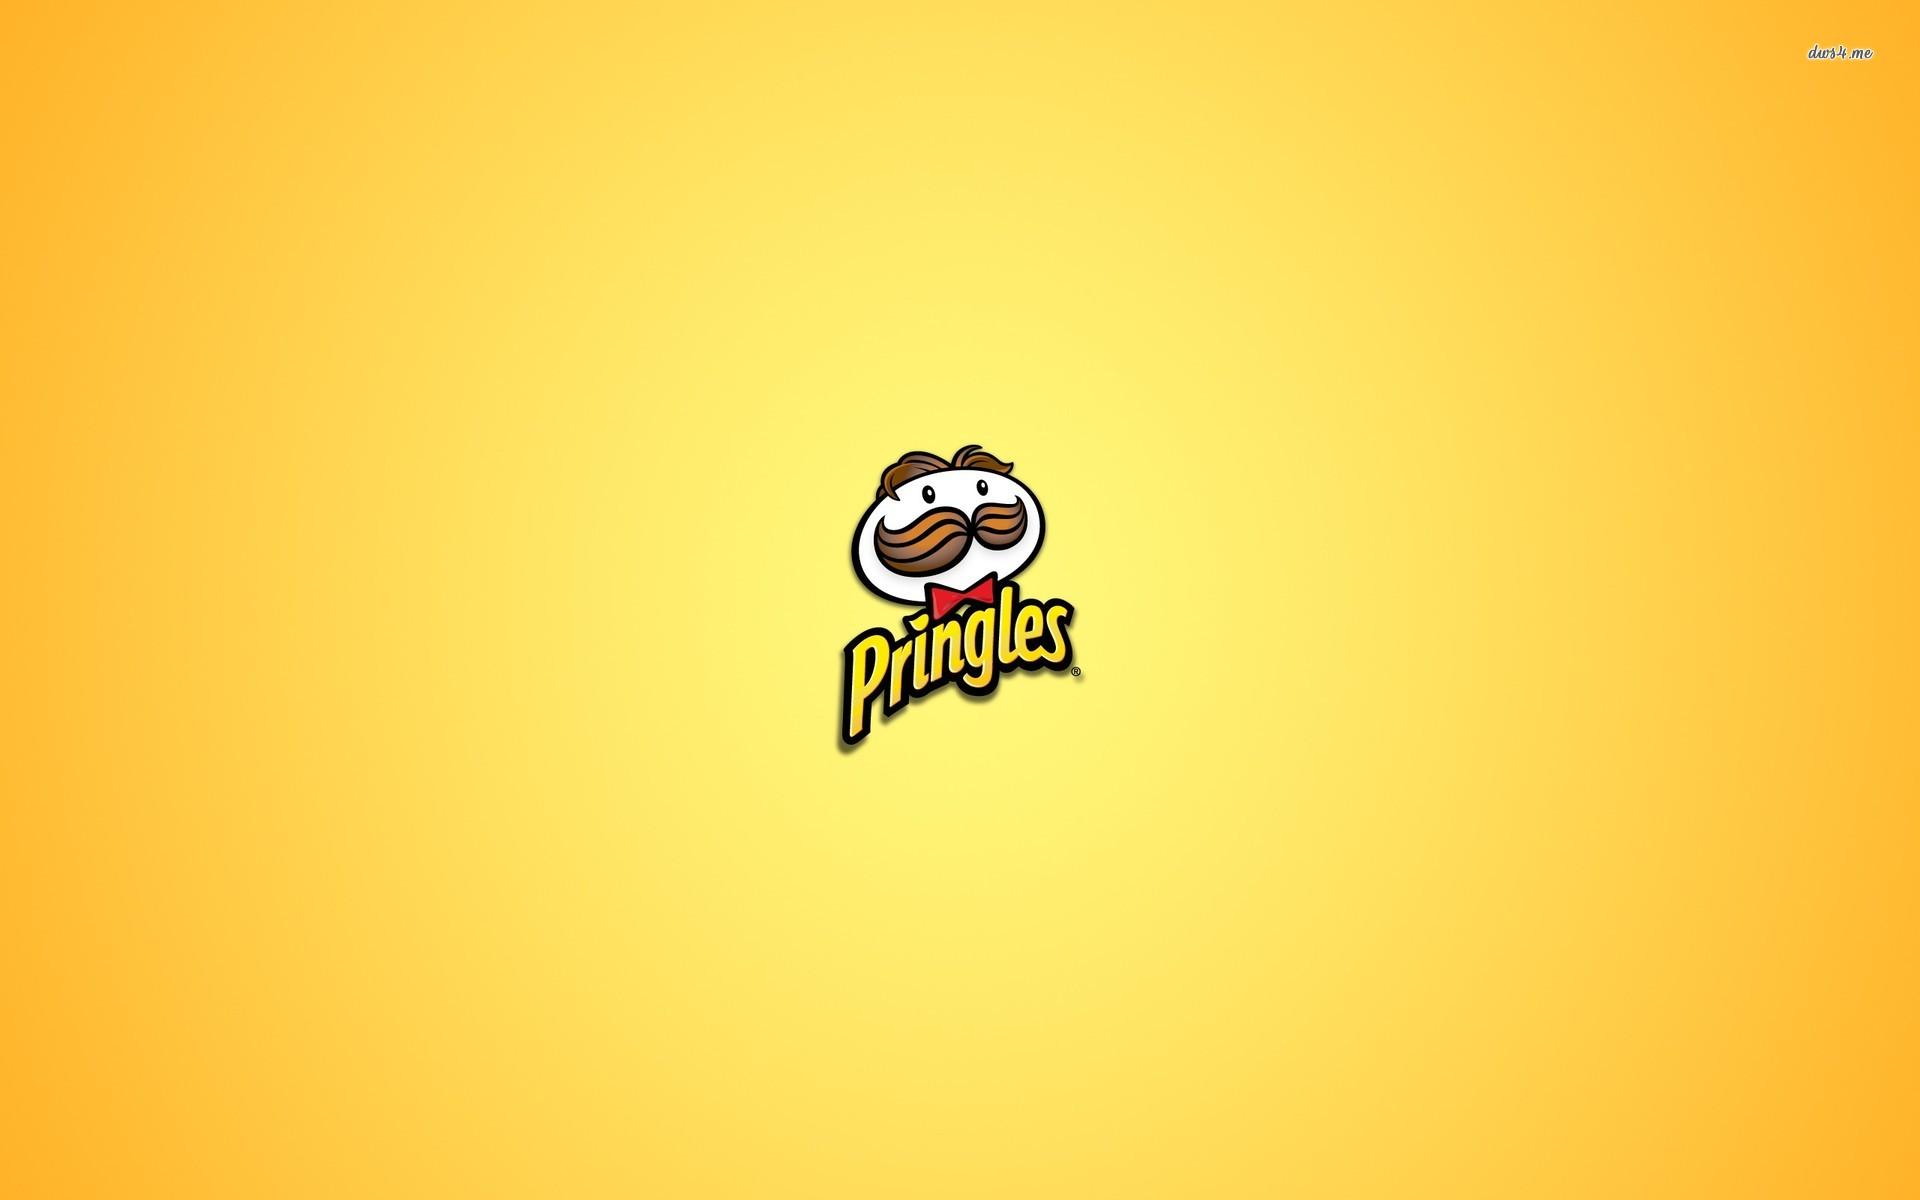 Pringles wallpaper   Minimalistic wallpapers   39872 1920x1200